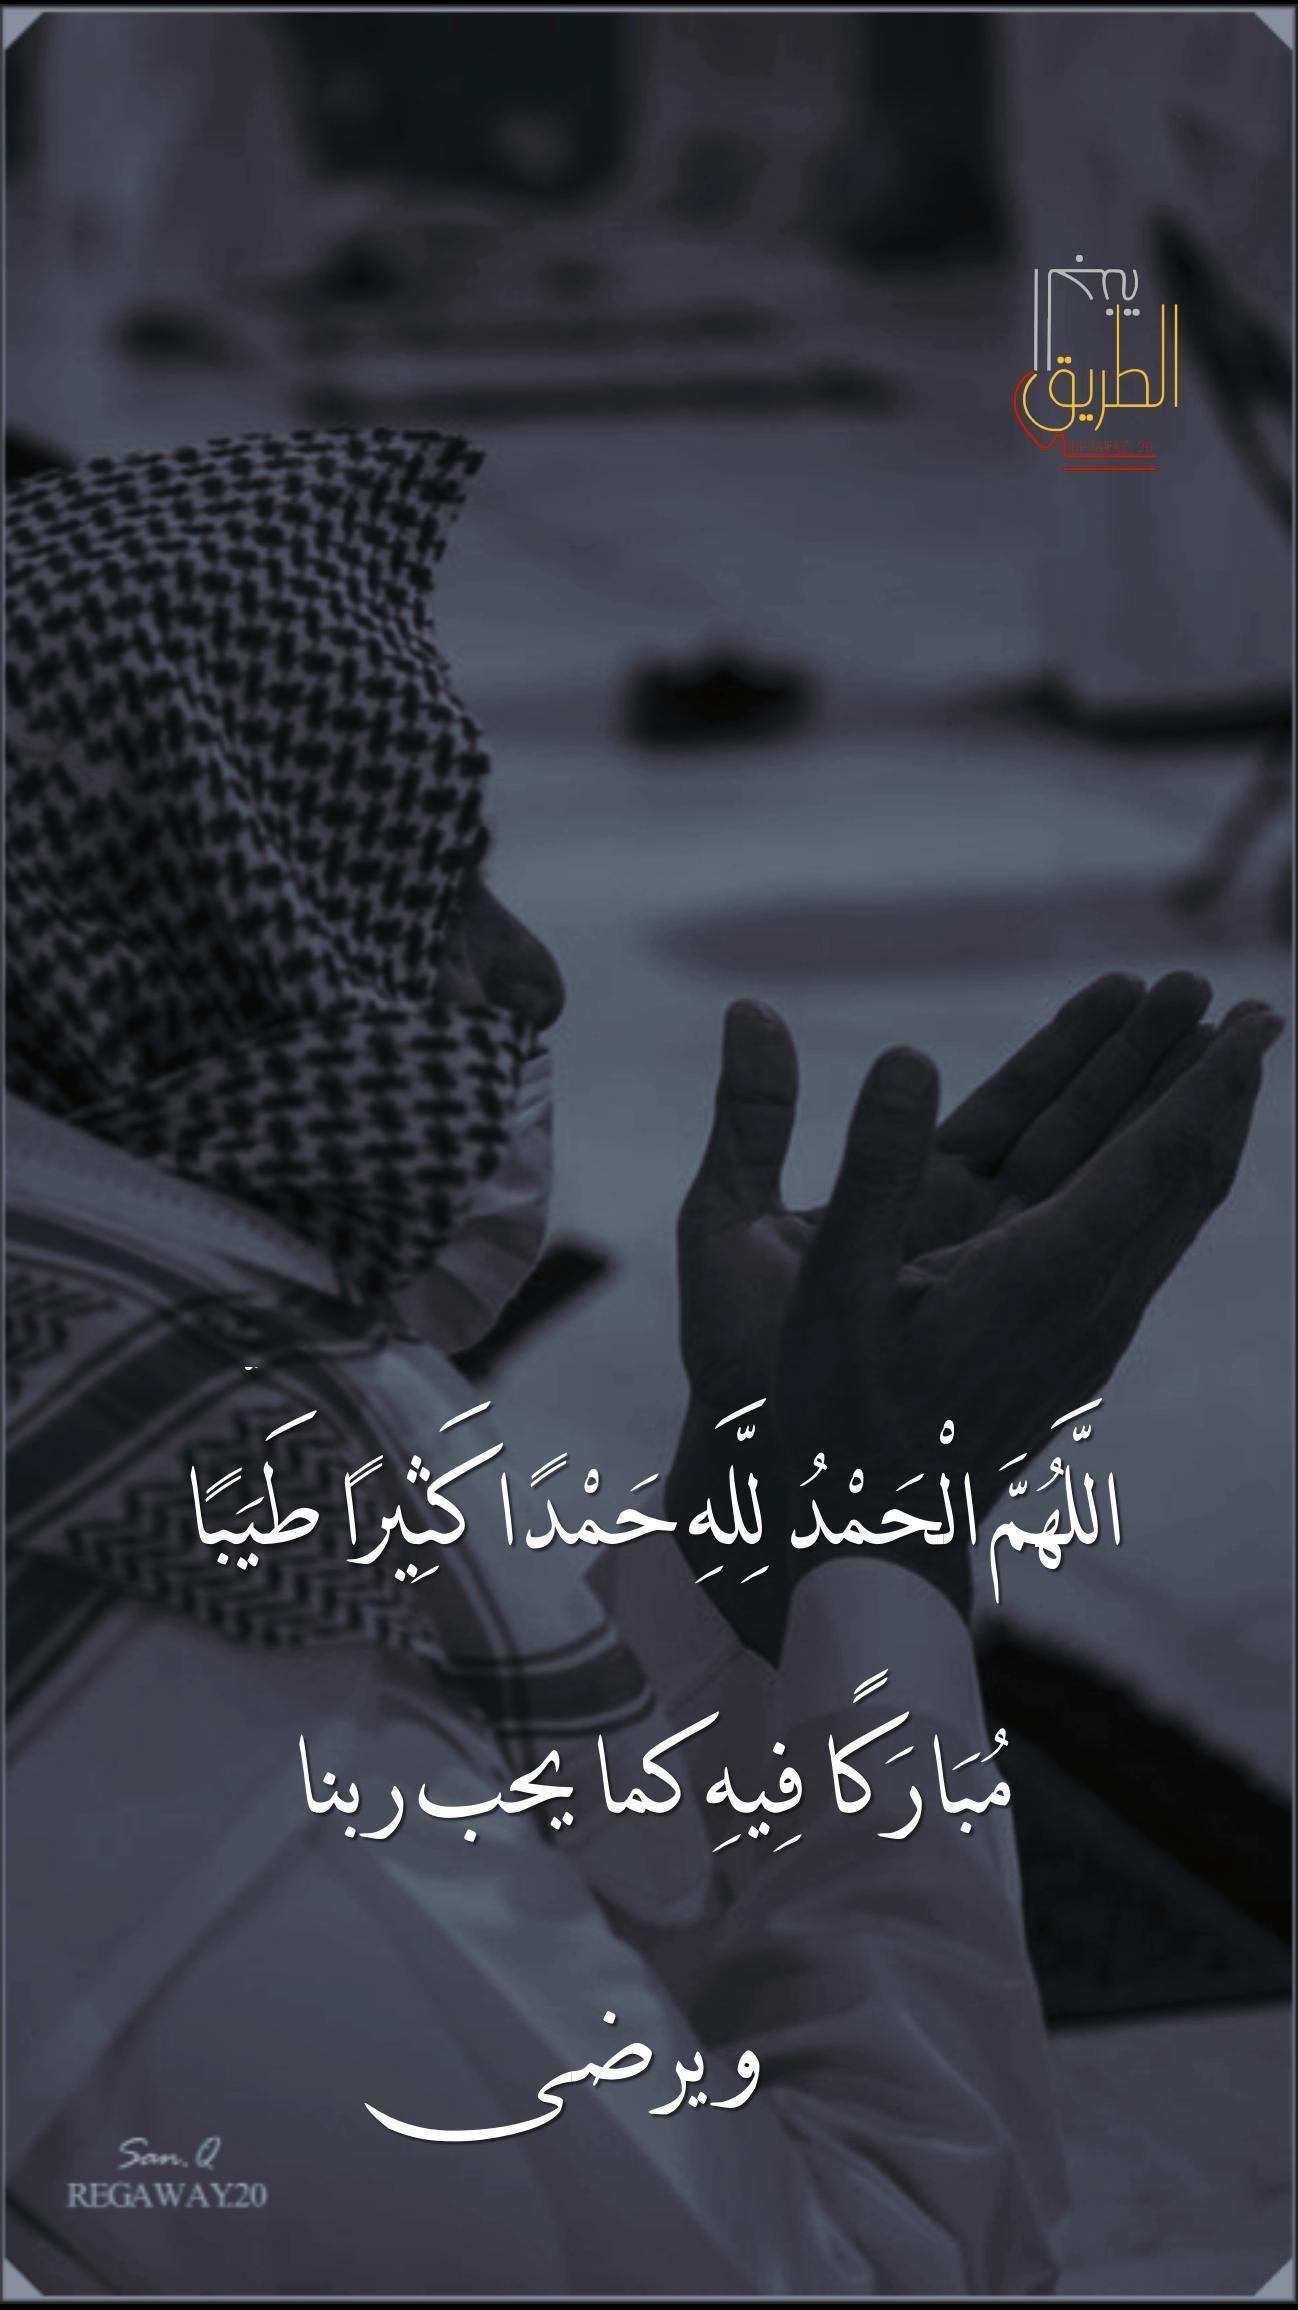 الل ه م ال ح م د ل ل ه ح م د ا ك ث ير ا ط ي ب ا Video In 2021 Beautiful Quran Quotes Quran Quotes Love Quran Recitation